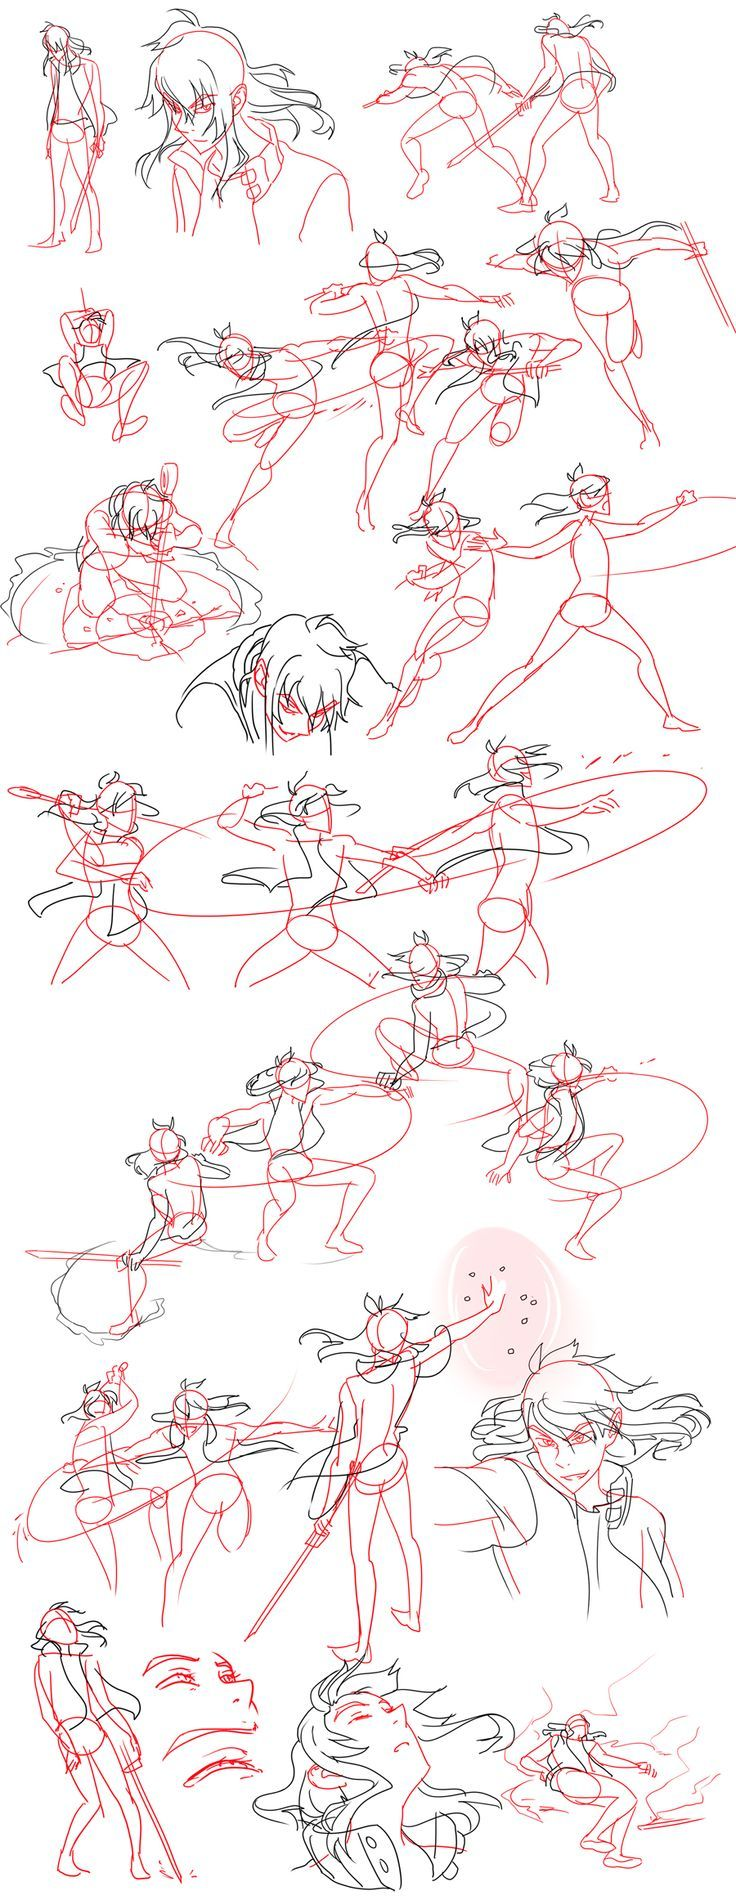 Fight Sketches by Flipfloppery.deviantart.com on @deviantART